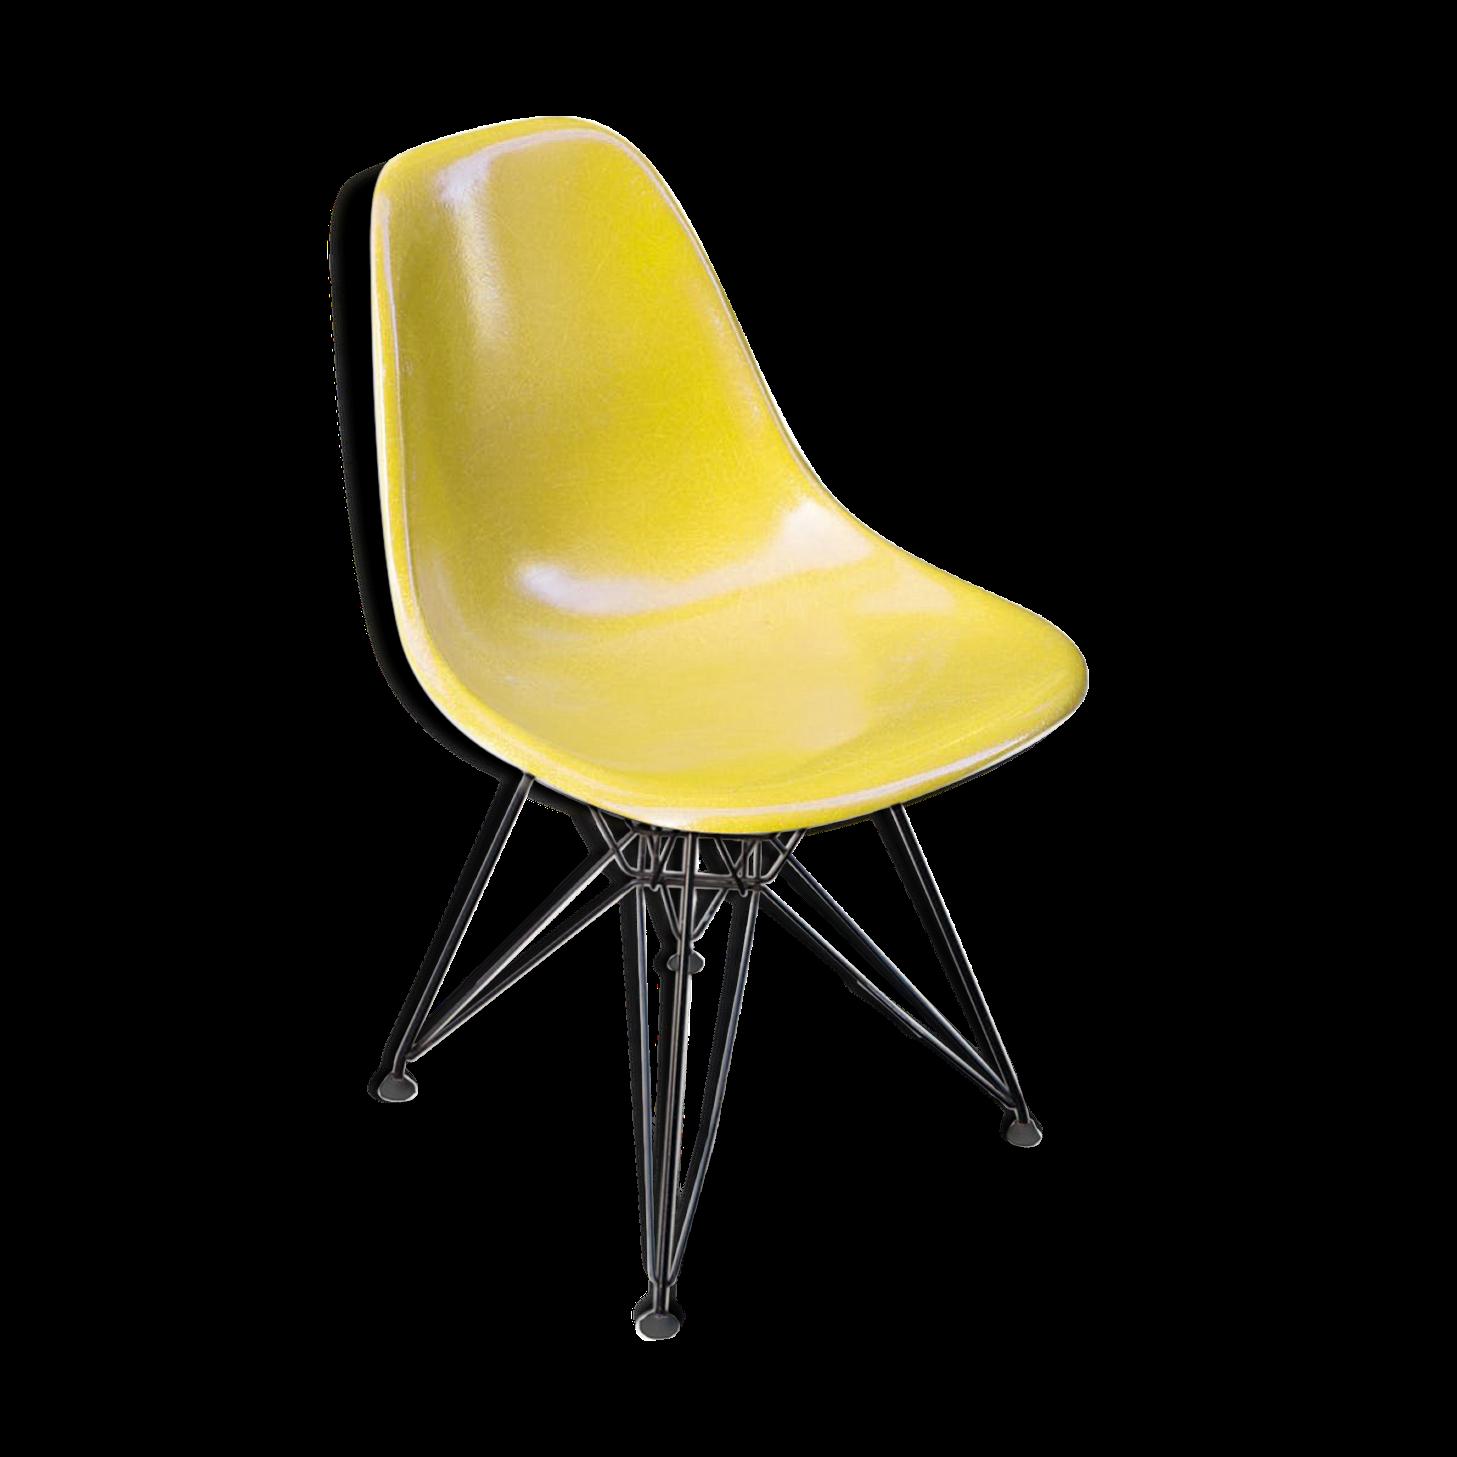 chaise eiffel cool the eiffel armchair inspired modern. Black Bedroom Furniture Sets. Home Design Ideas